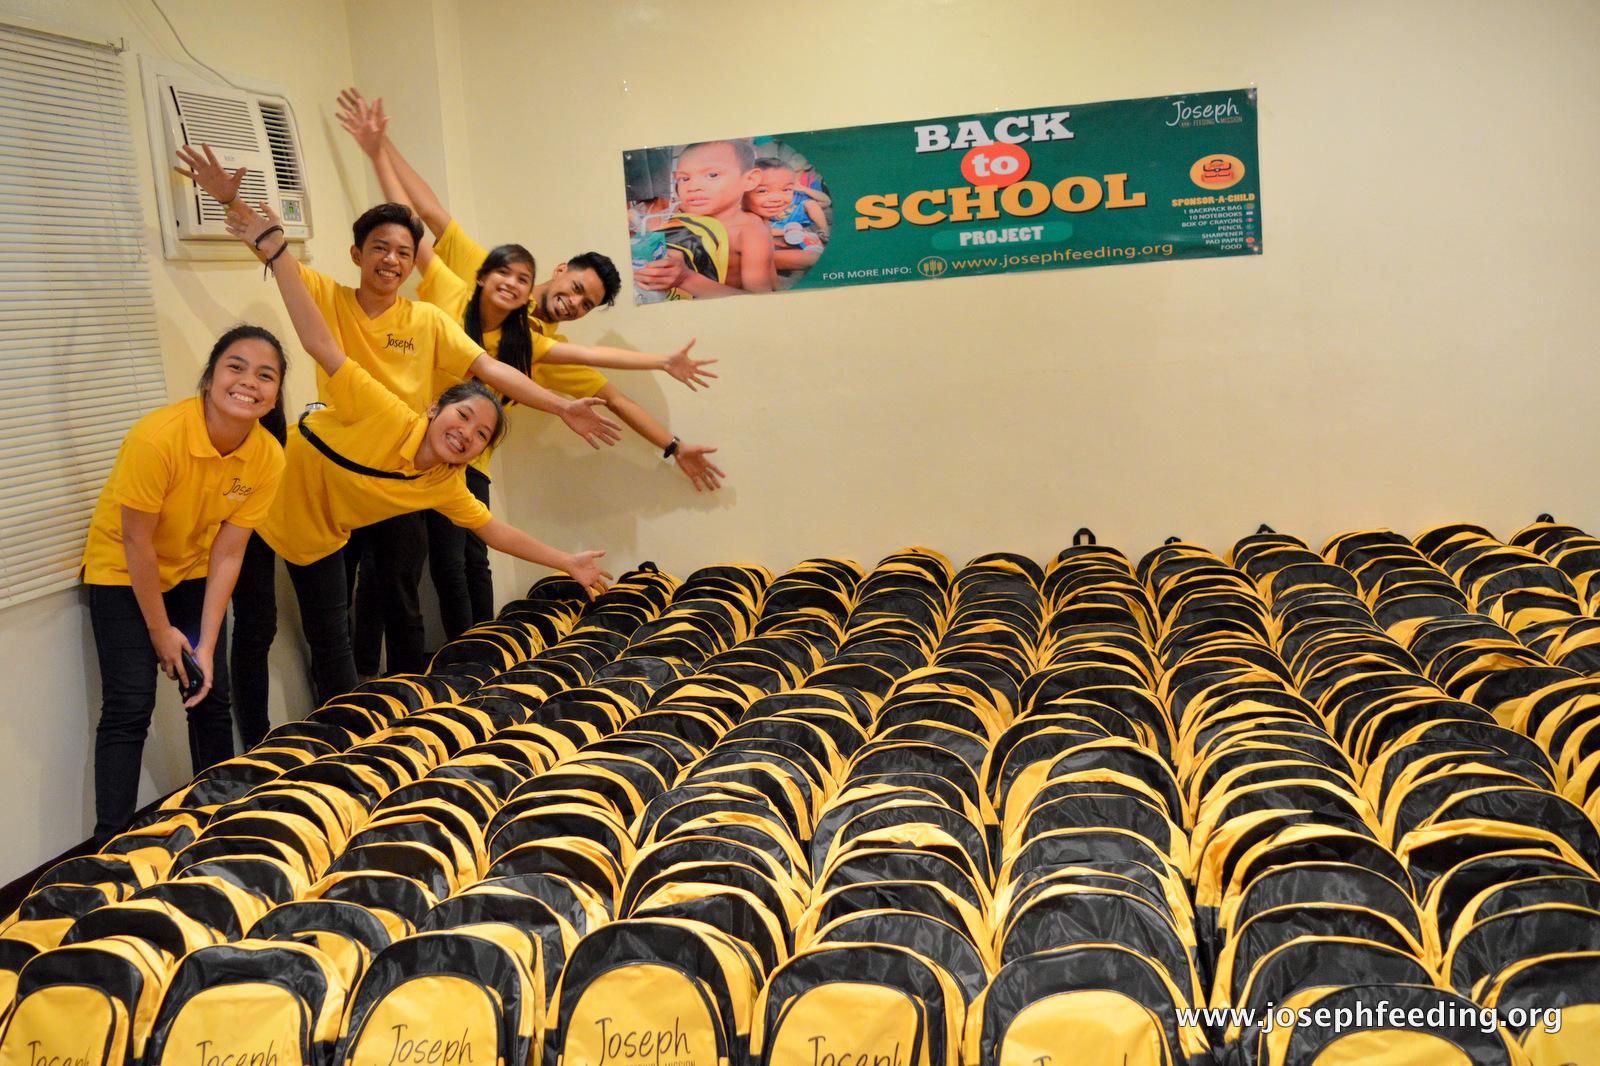 19-JFM-1606-BACK TO SCHOOL BAG REPACKING-018